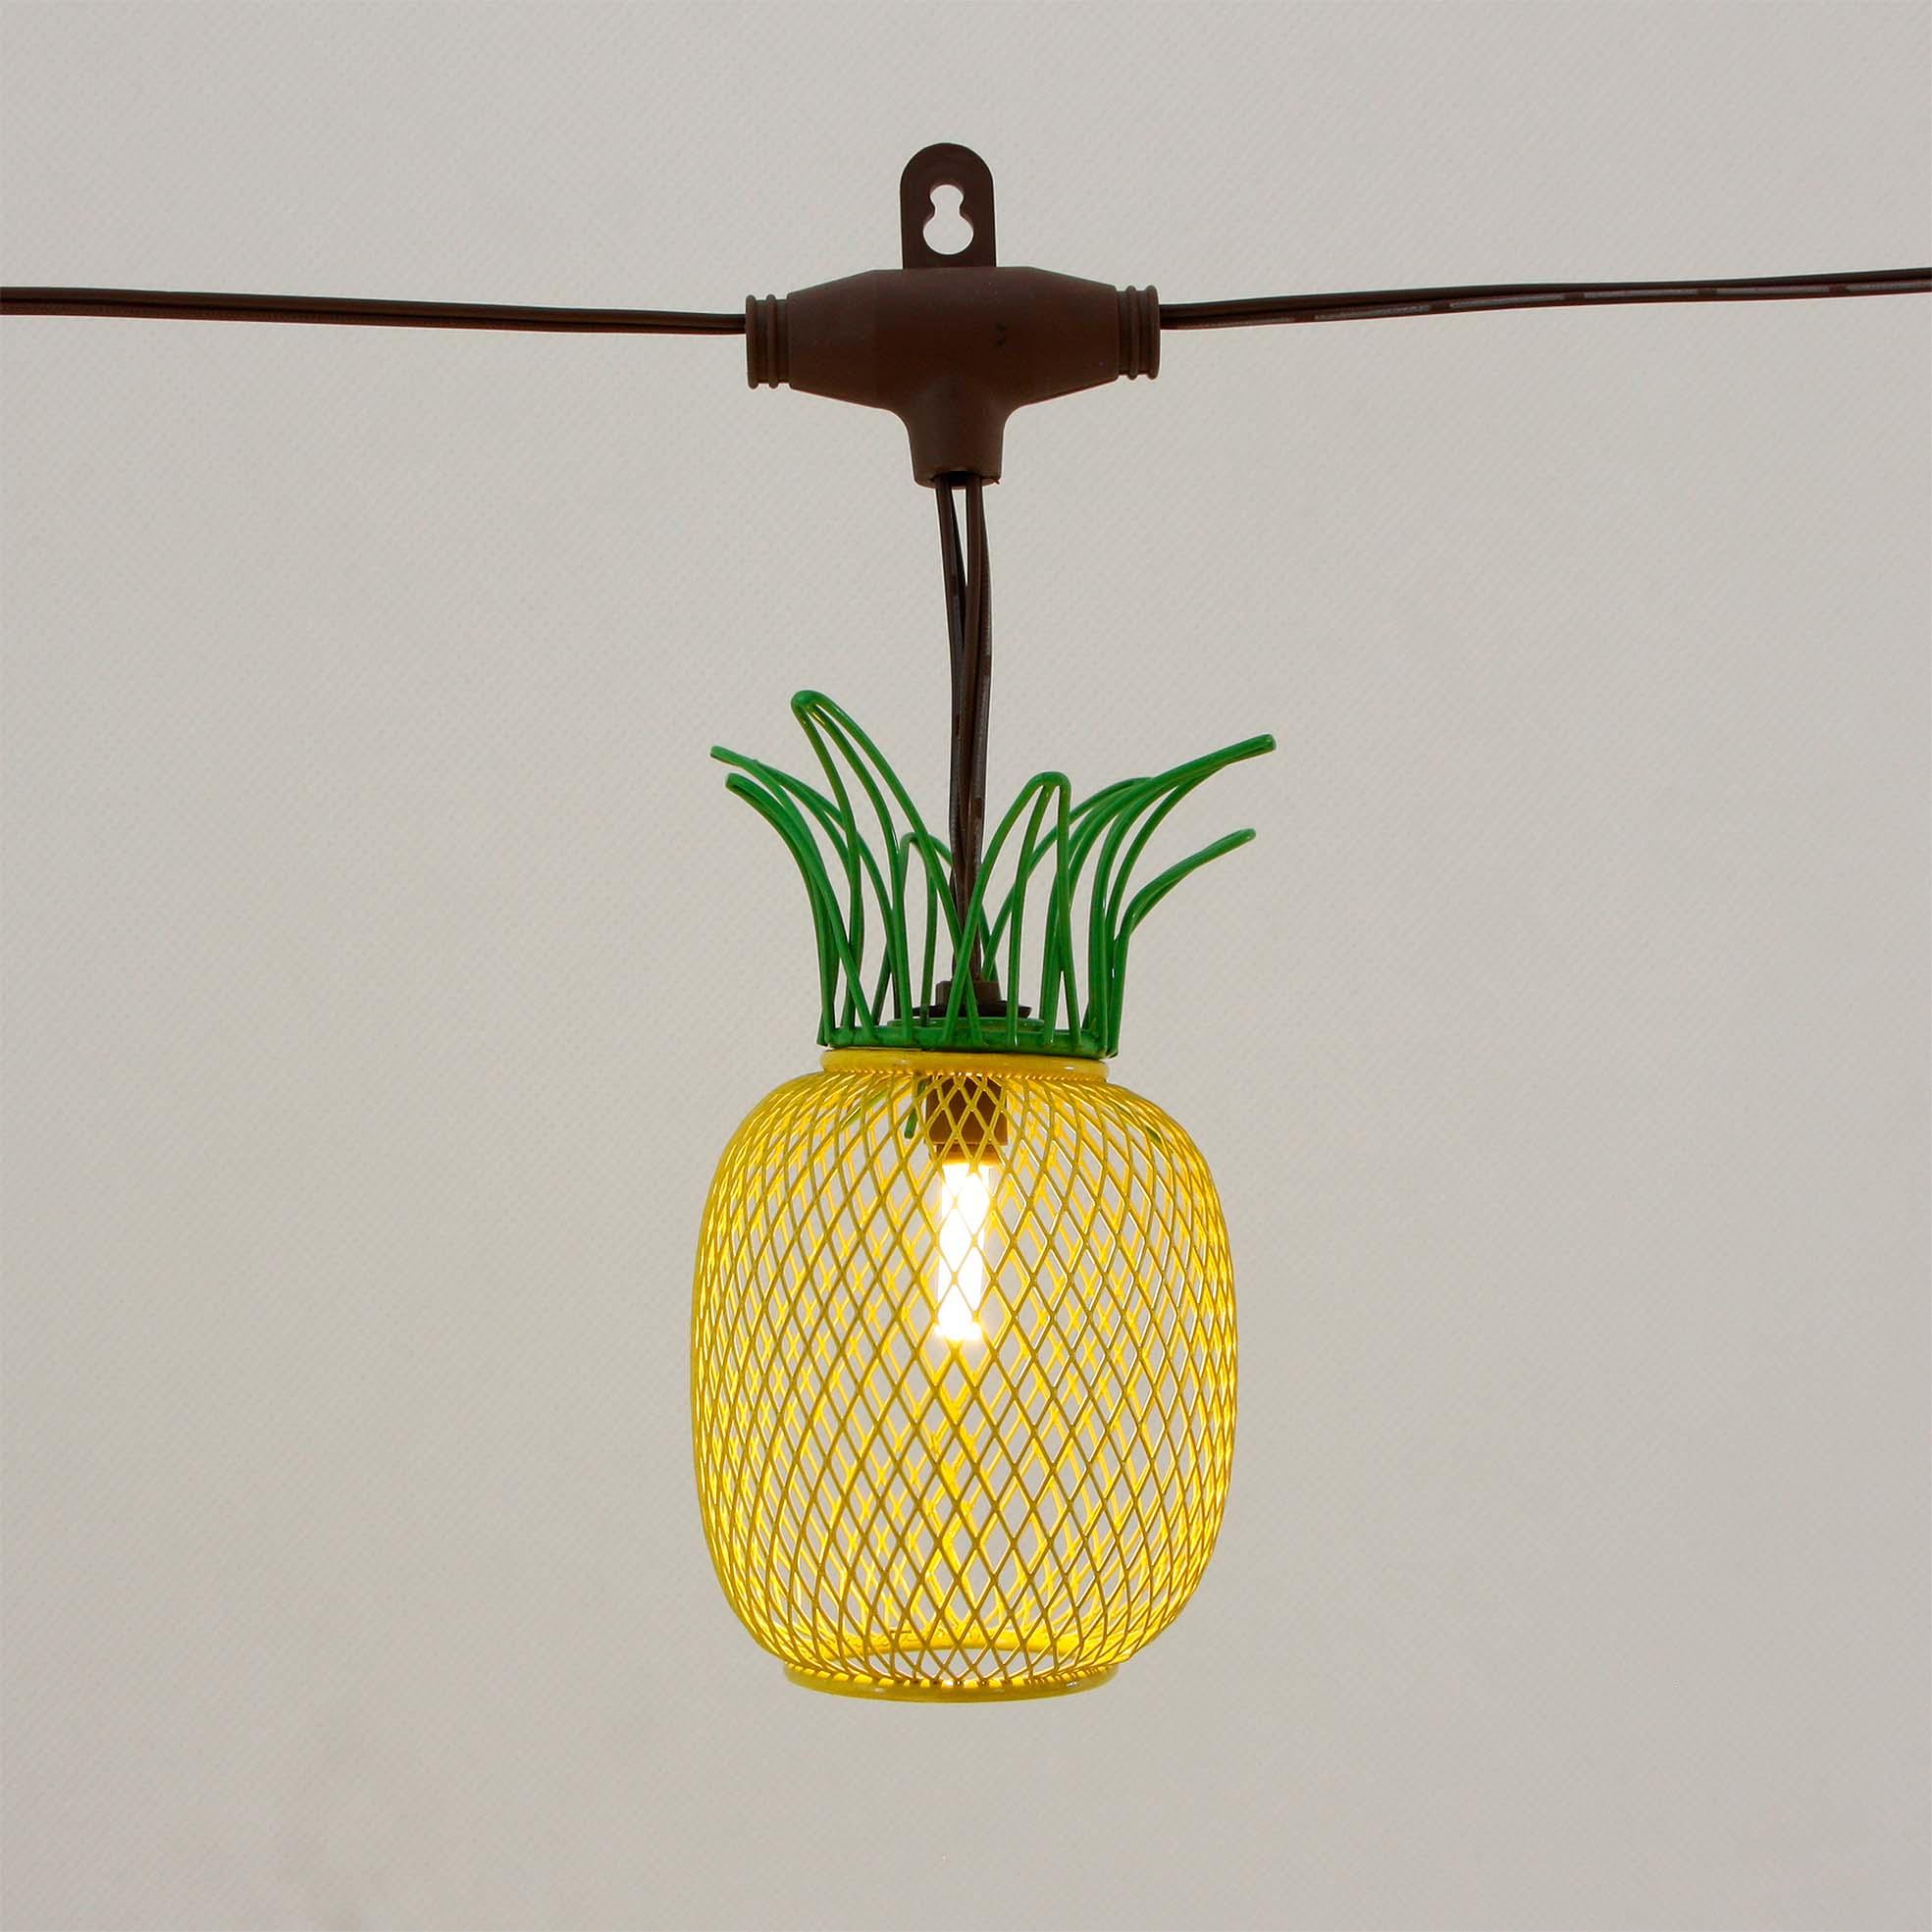 Decorative Umbrella Lights  MYHH09068-SO(C) Featured Image